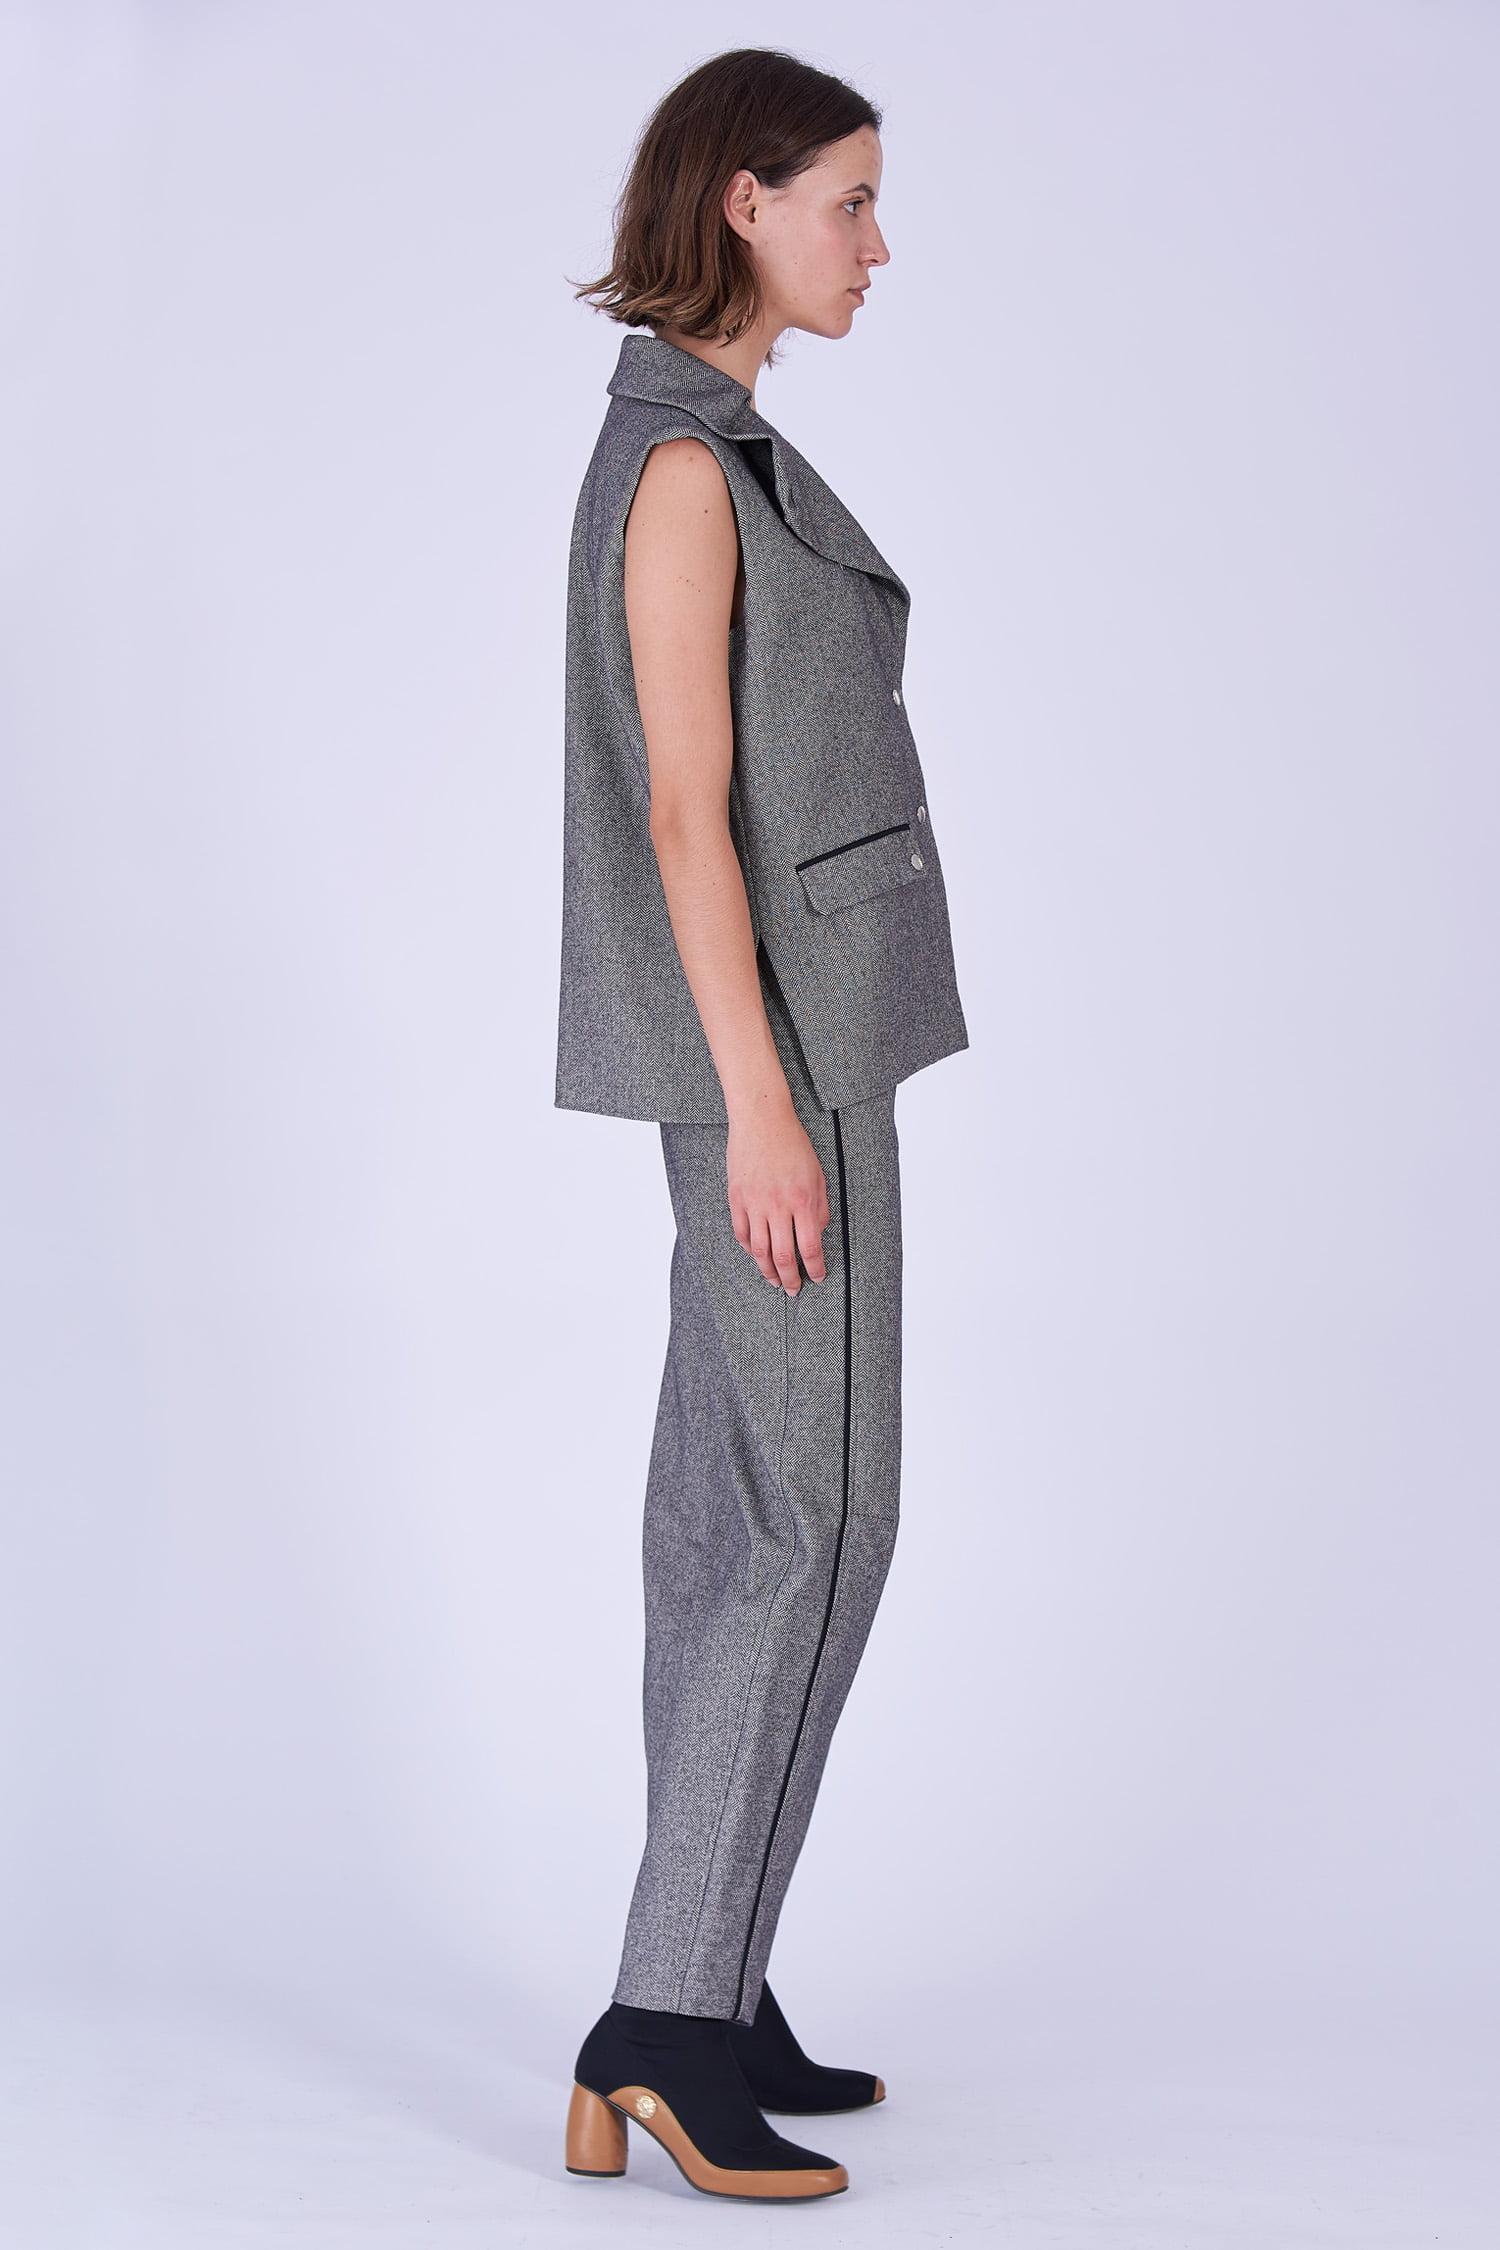 Acephala Fw19 20 Grey Herringbone Wool Sleeveless Jacket Trousers Marynarka Szara Jodelka Welna Spodnie Side 1